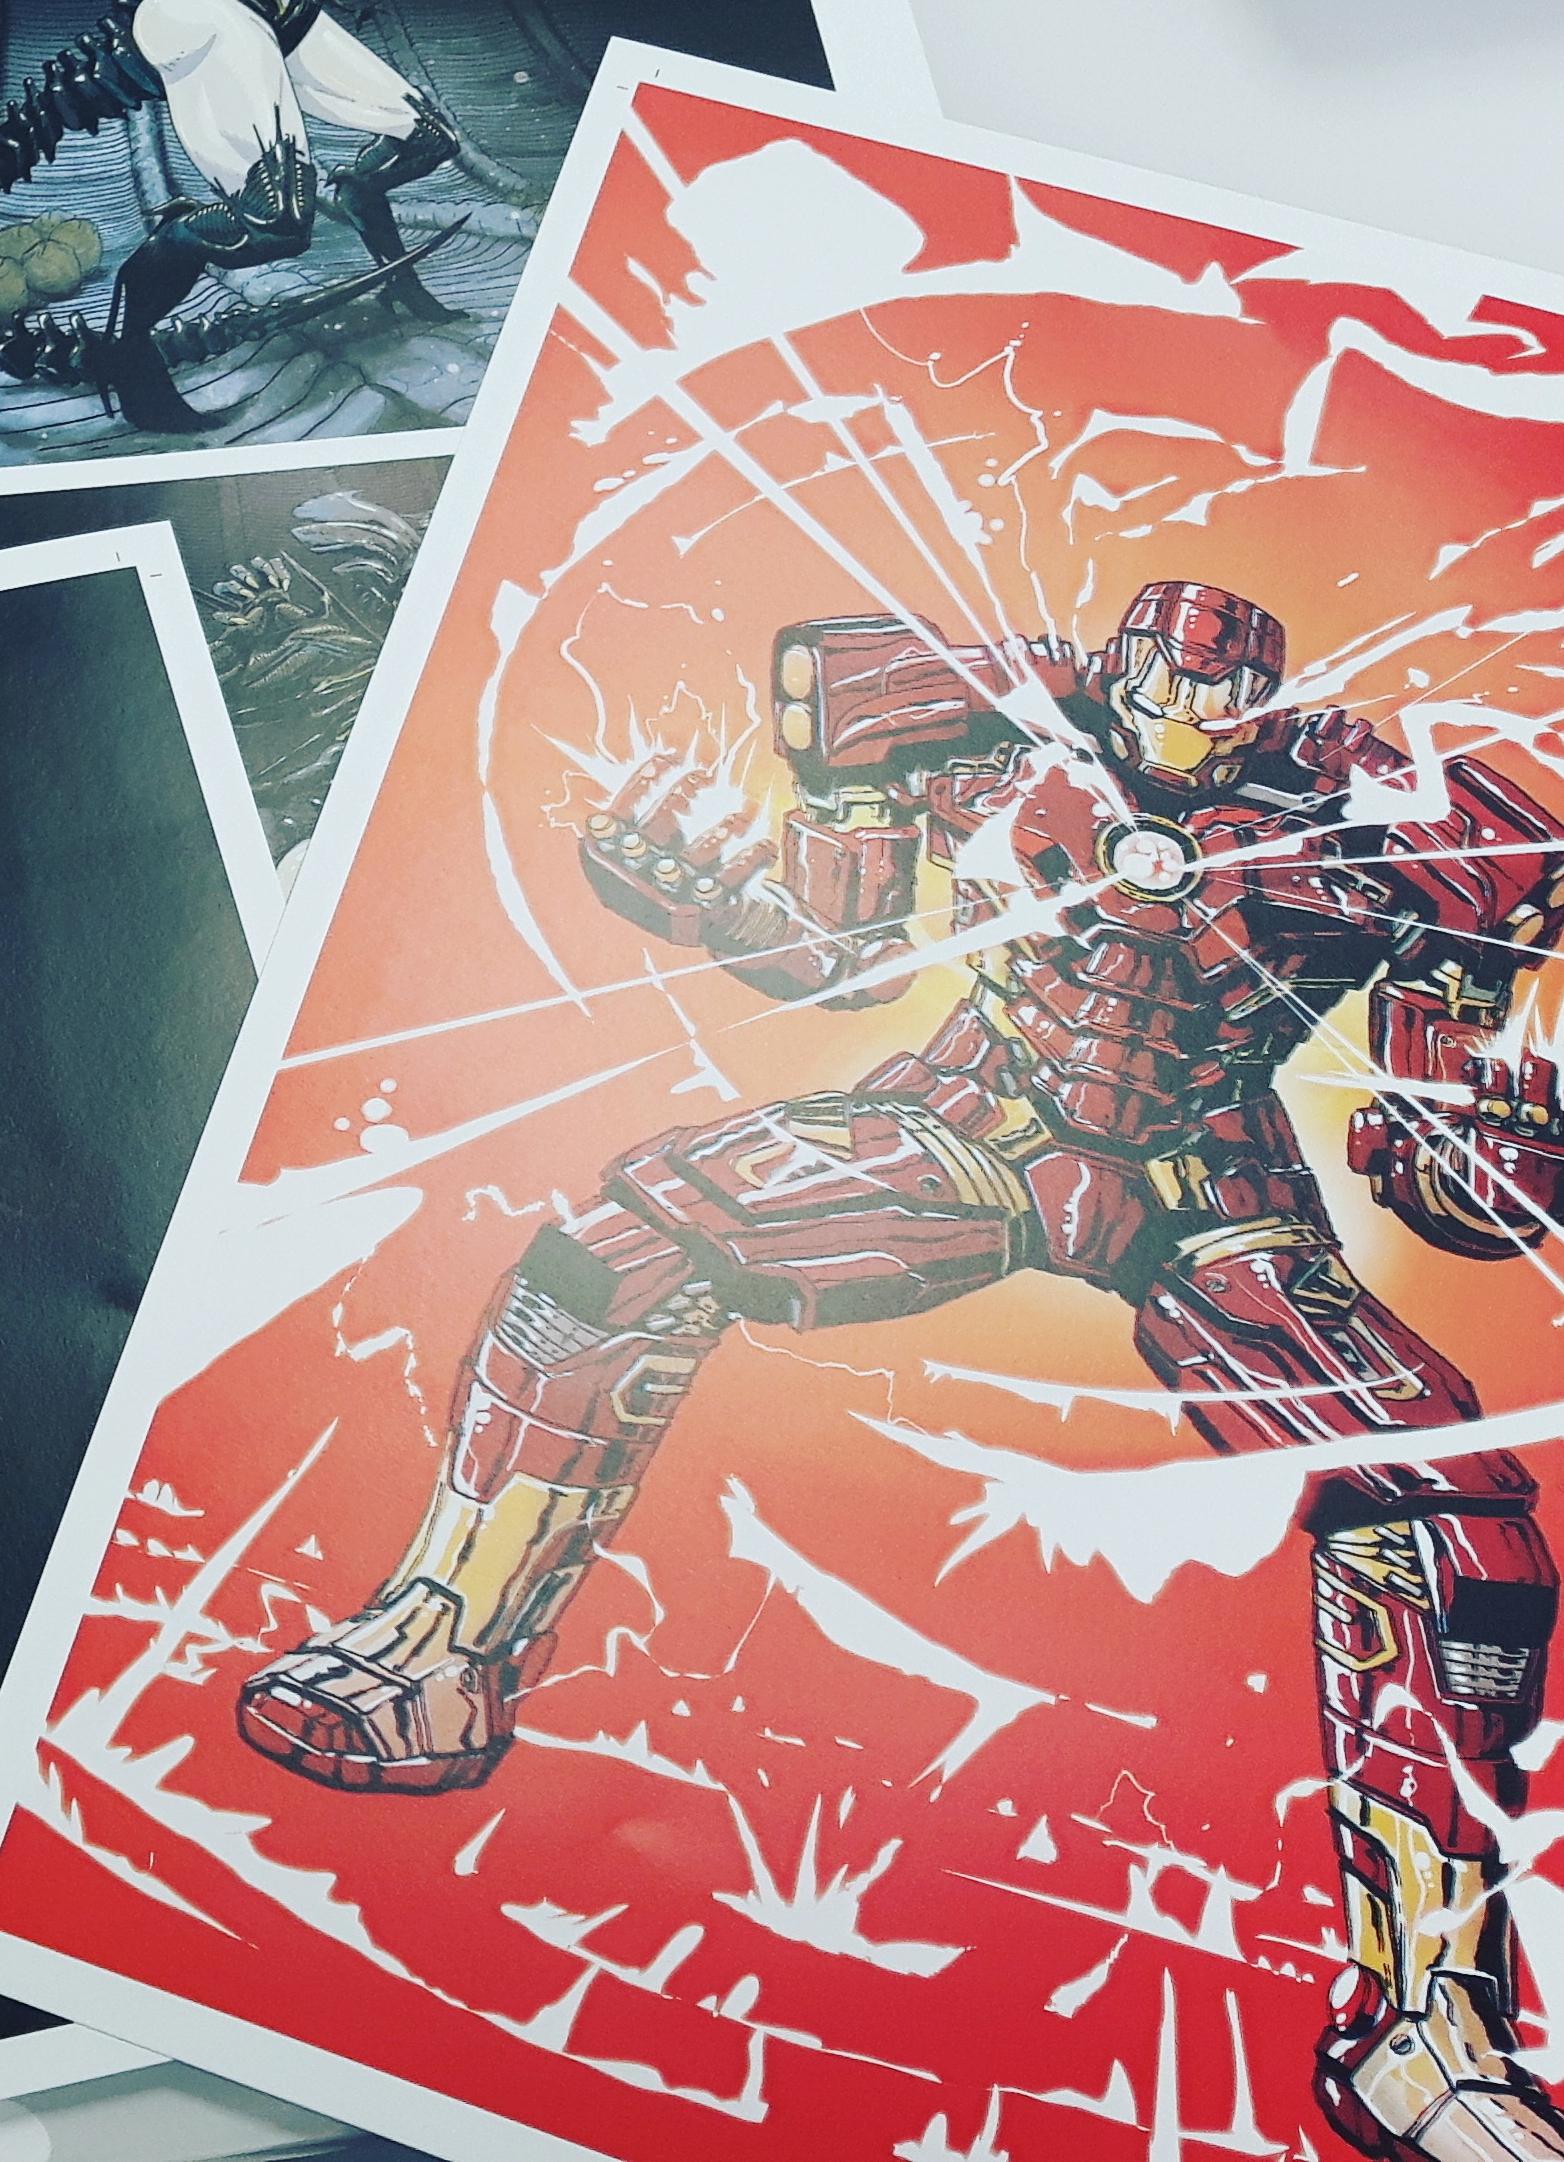 IRON MAN fan art poster from RodrigoShop